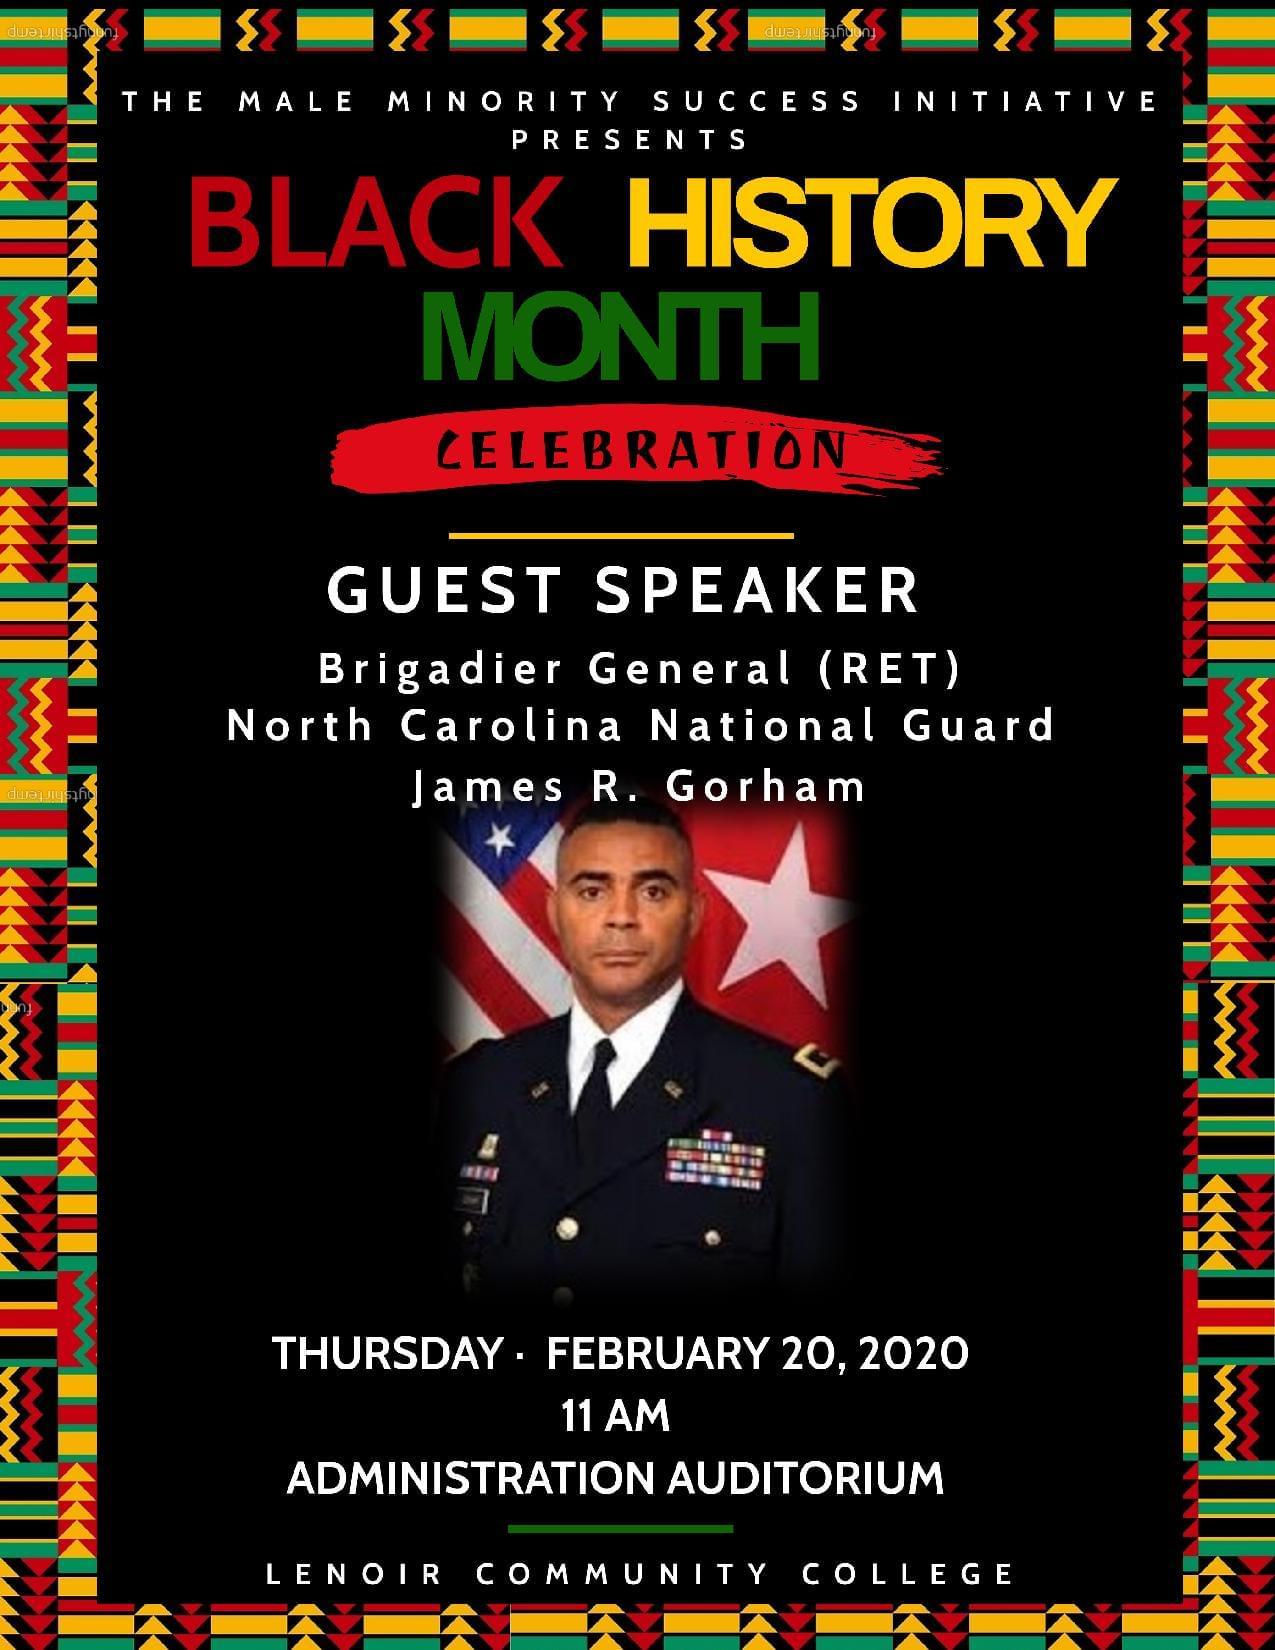 Lenoir Community College's Annual Black History Month Program